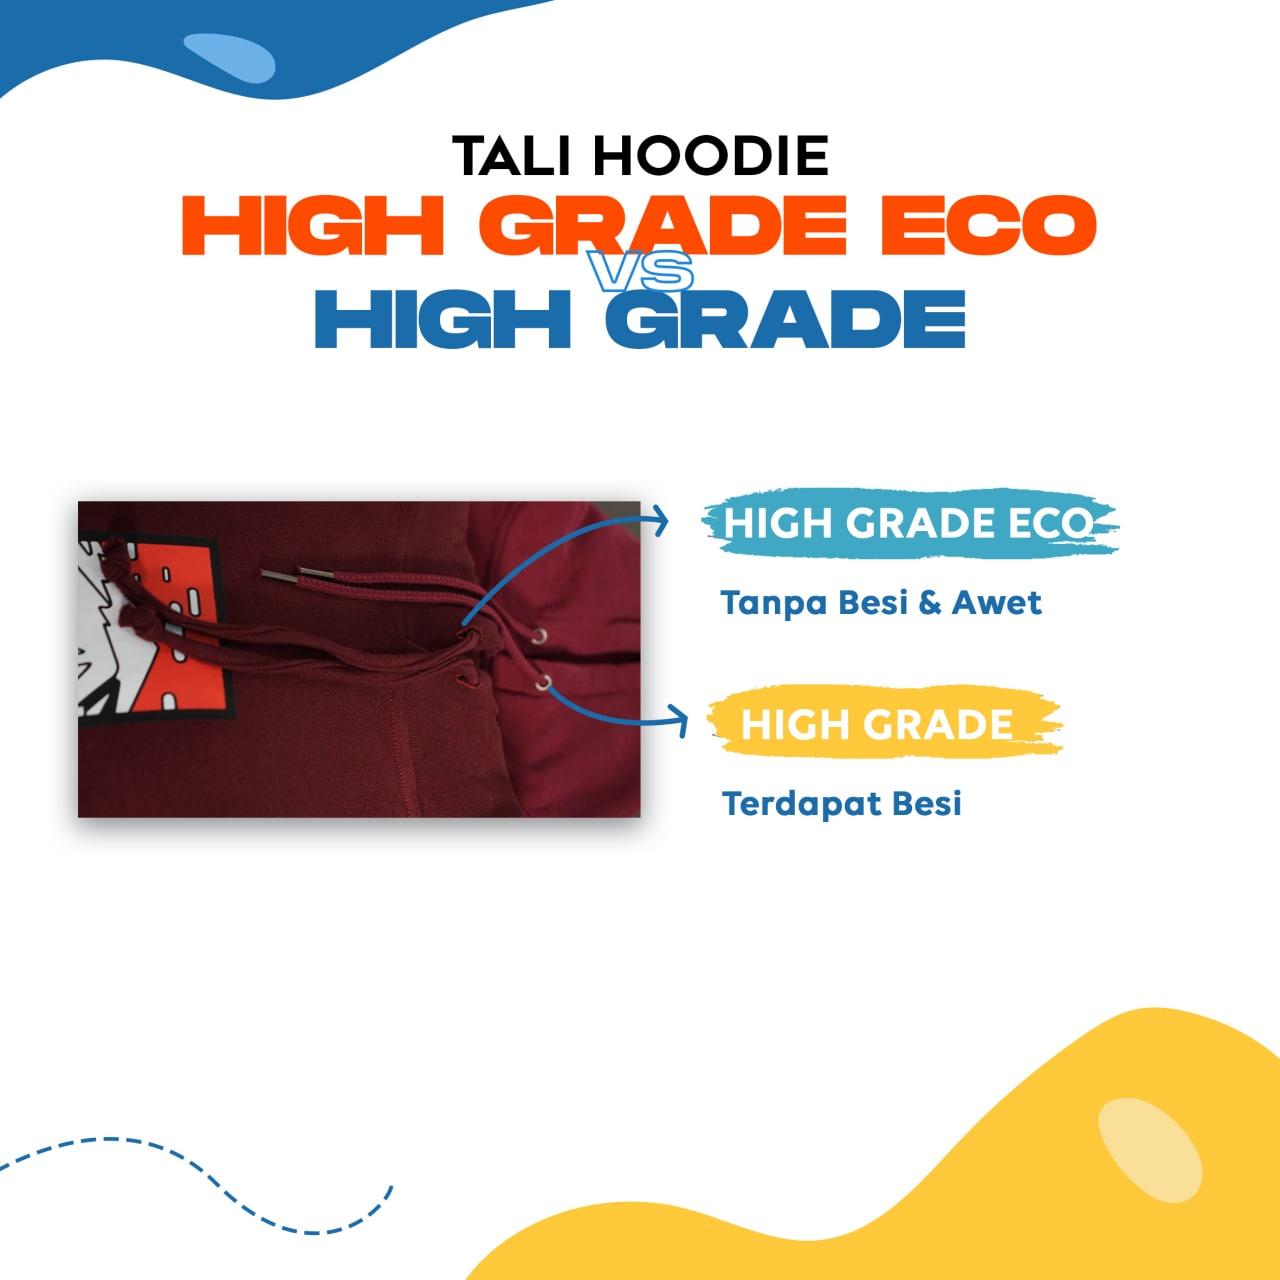 Spesifikasi Tali Hoodie